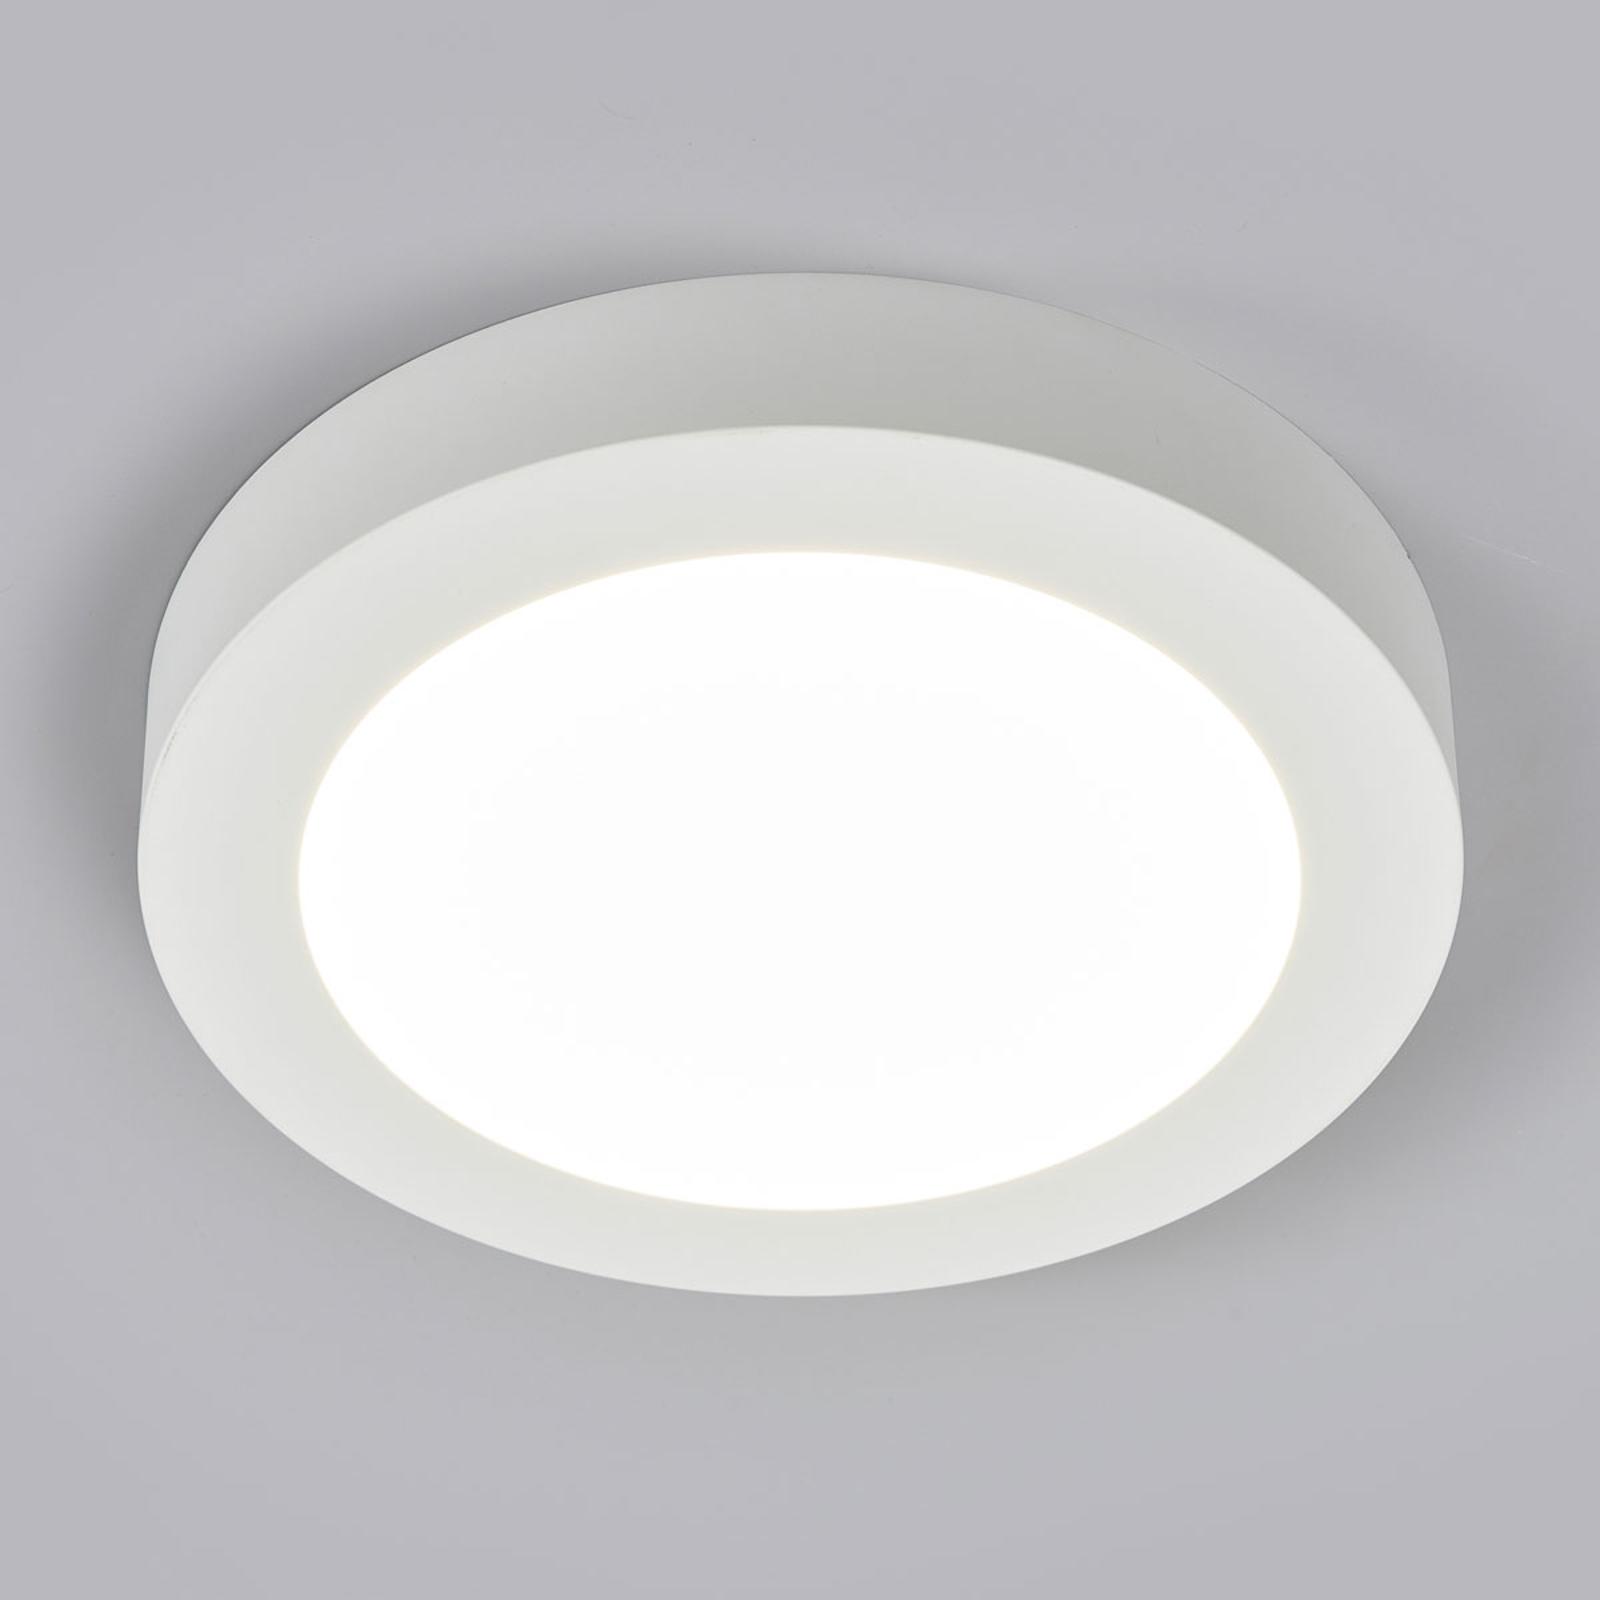 Plafoniera Marlo bianco 4000K rotonda 25,2cm